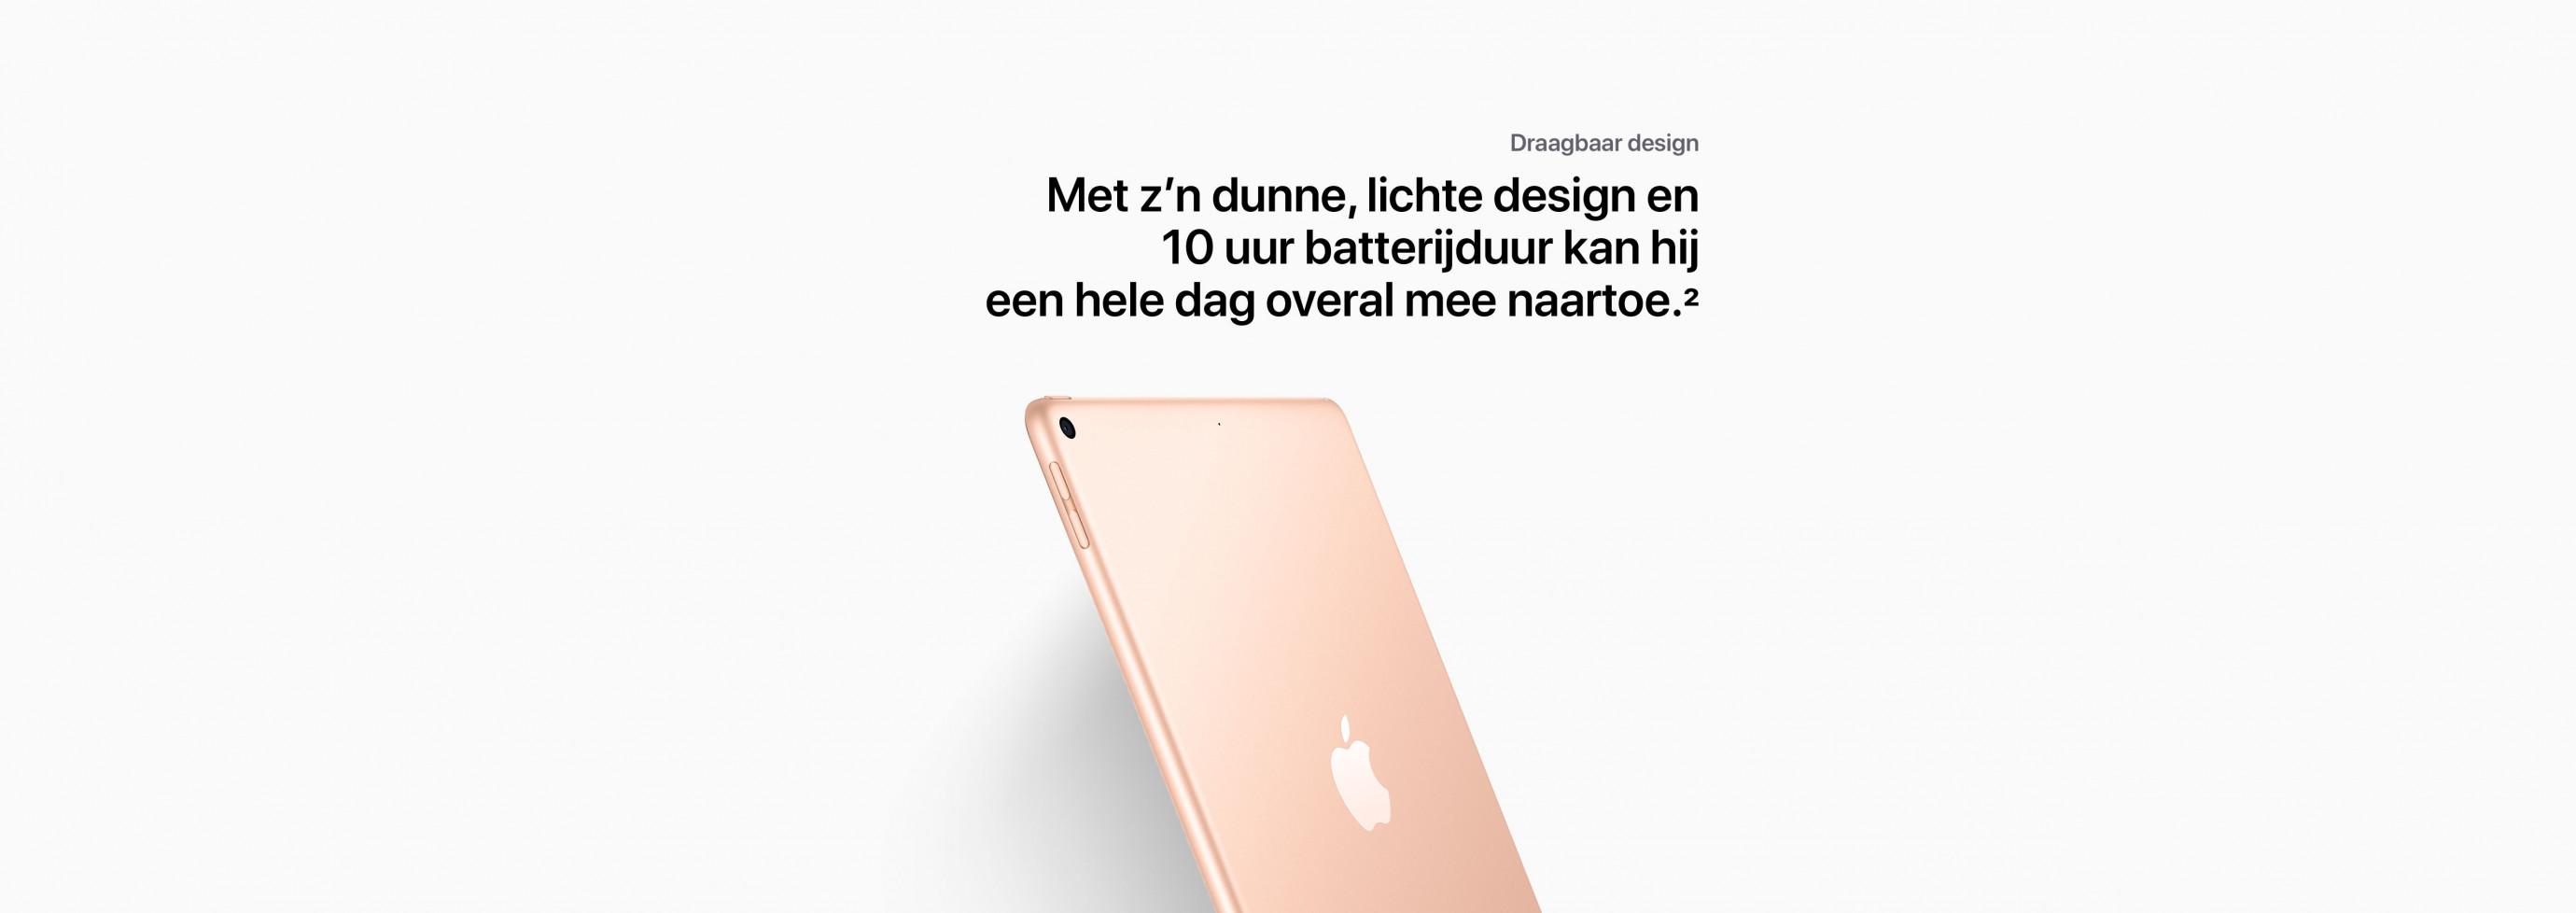 Productpage---iPad-Air-2019-nl_05.jpg